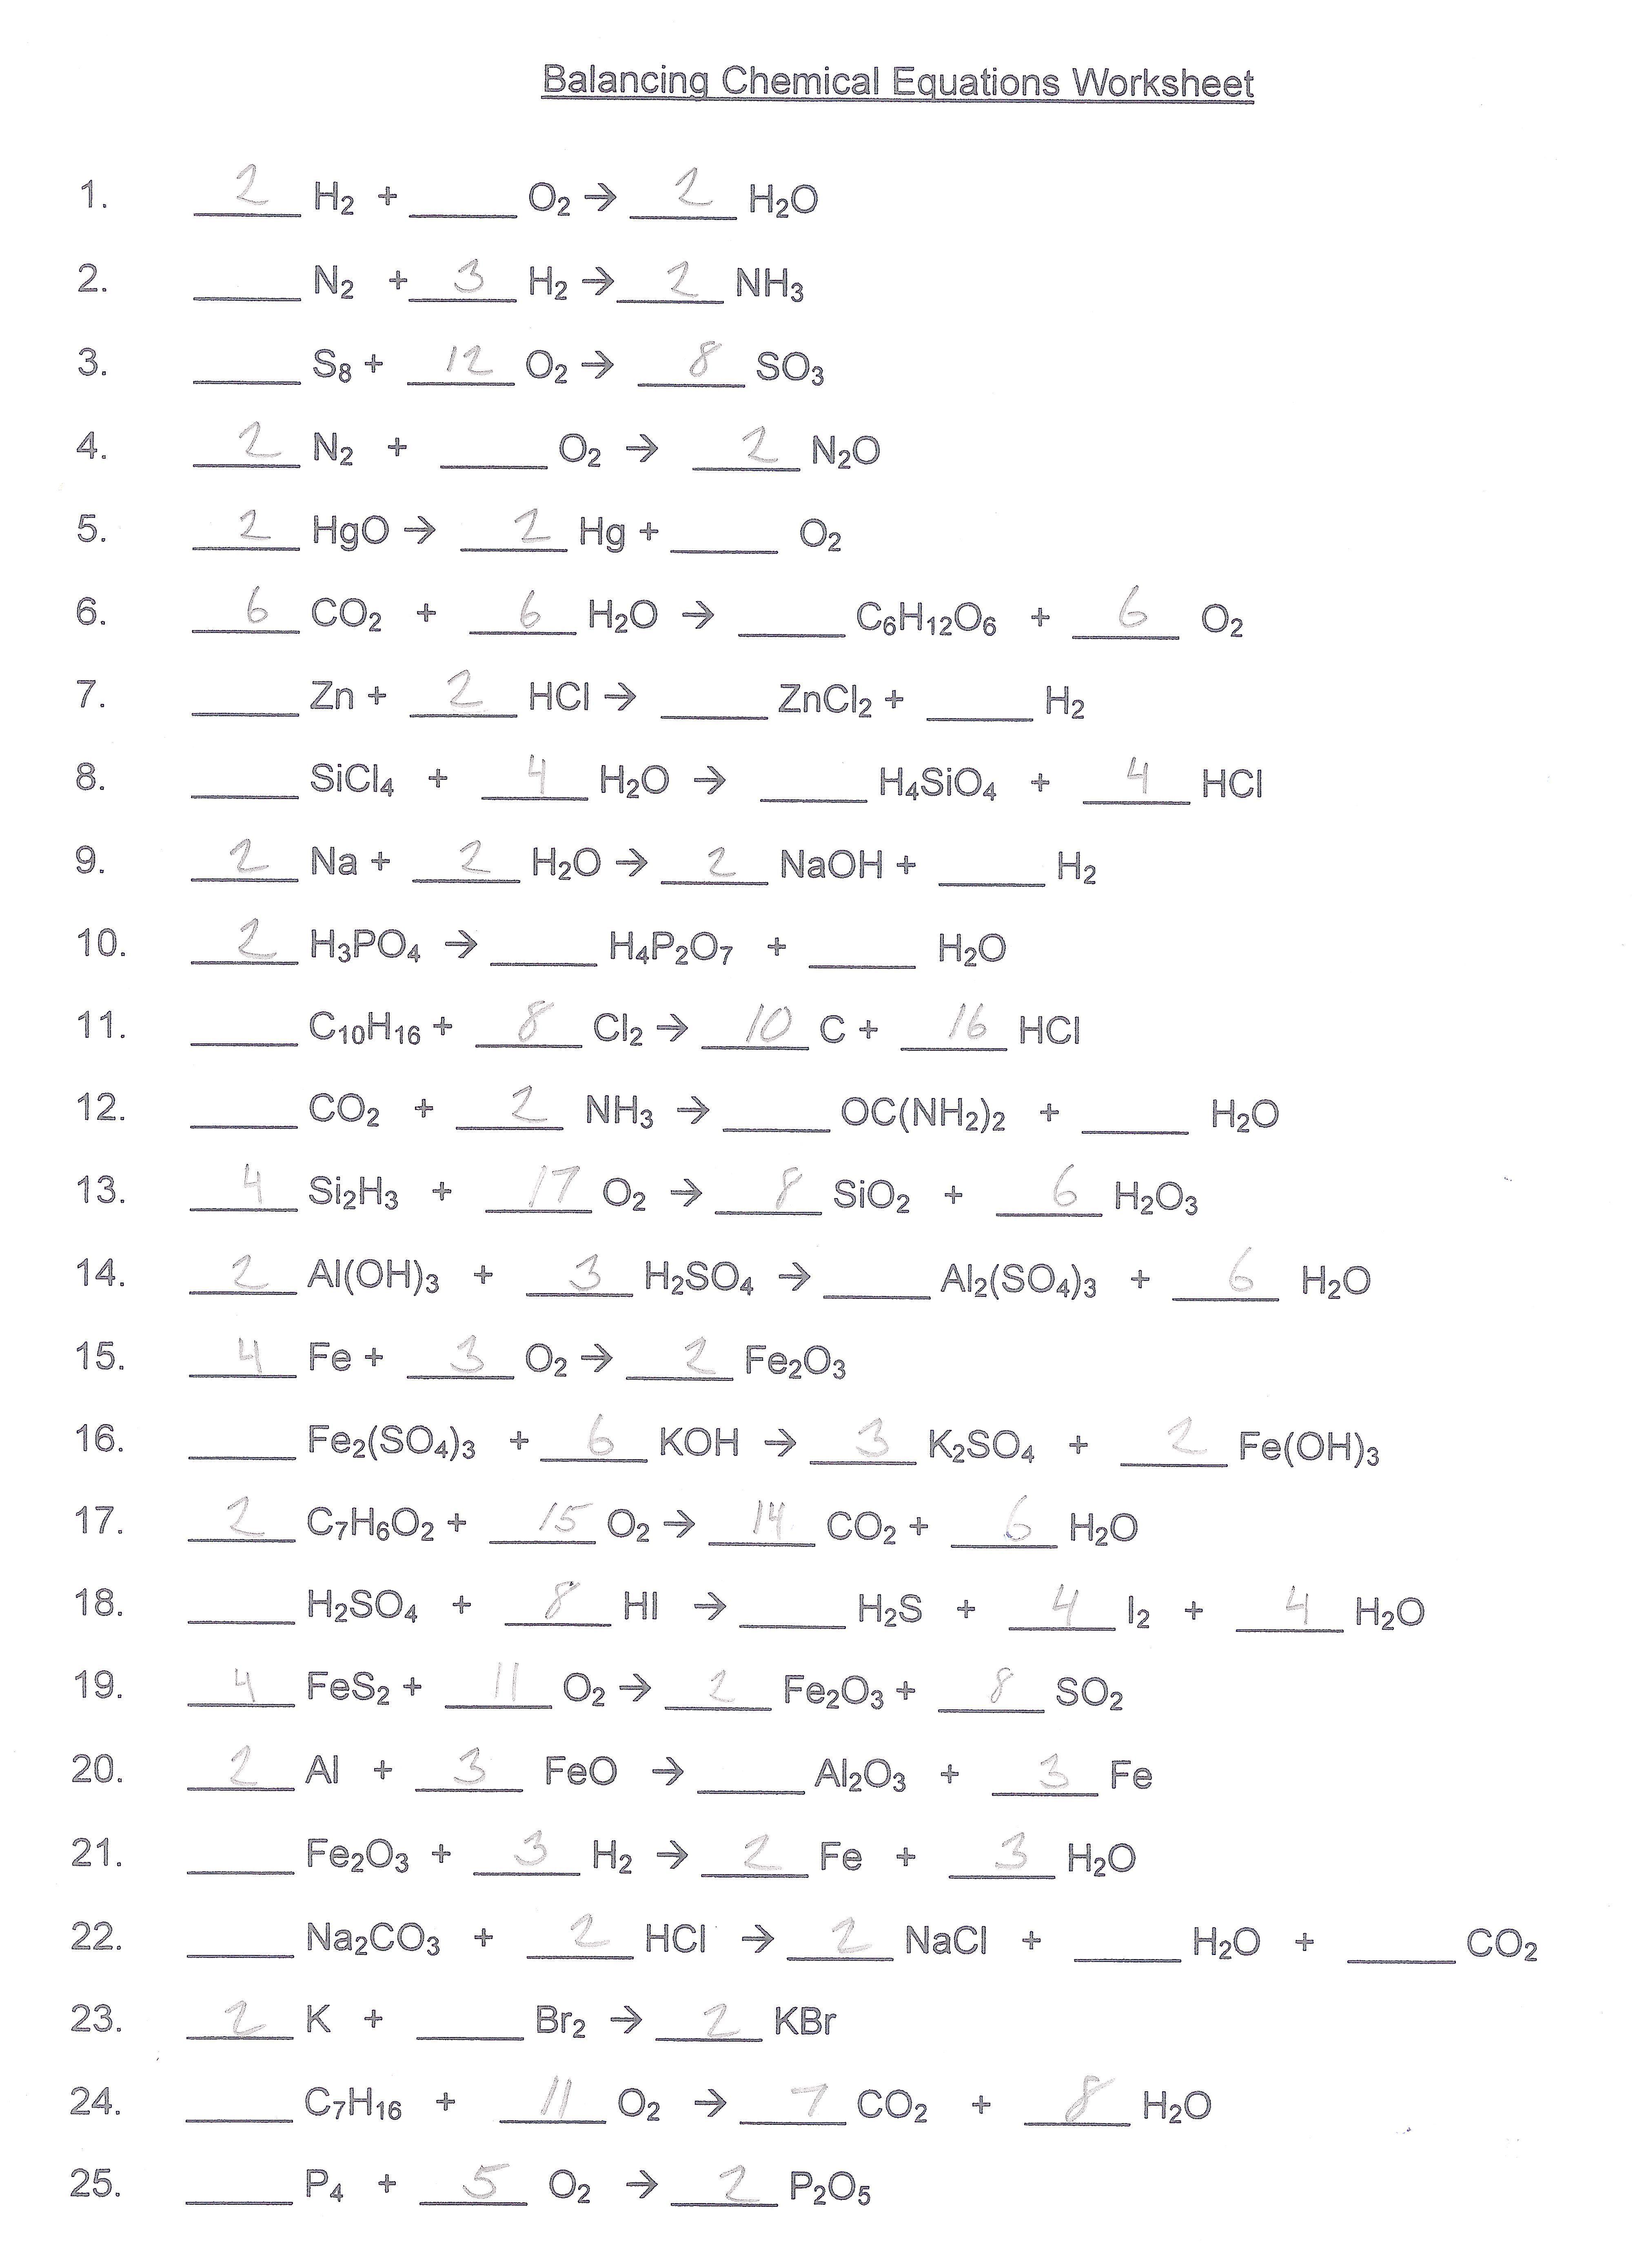 medium resolution of 37 Simple Balancing Equations Worksheet Ideas